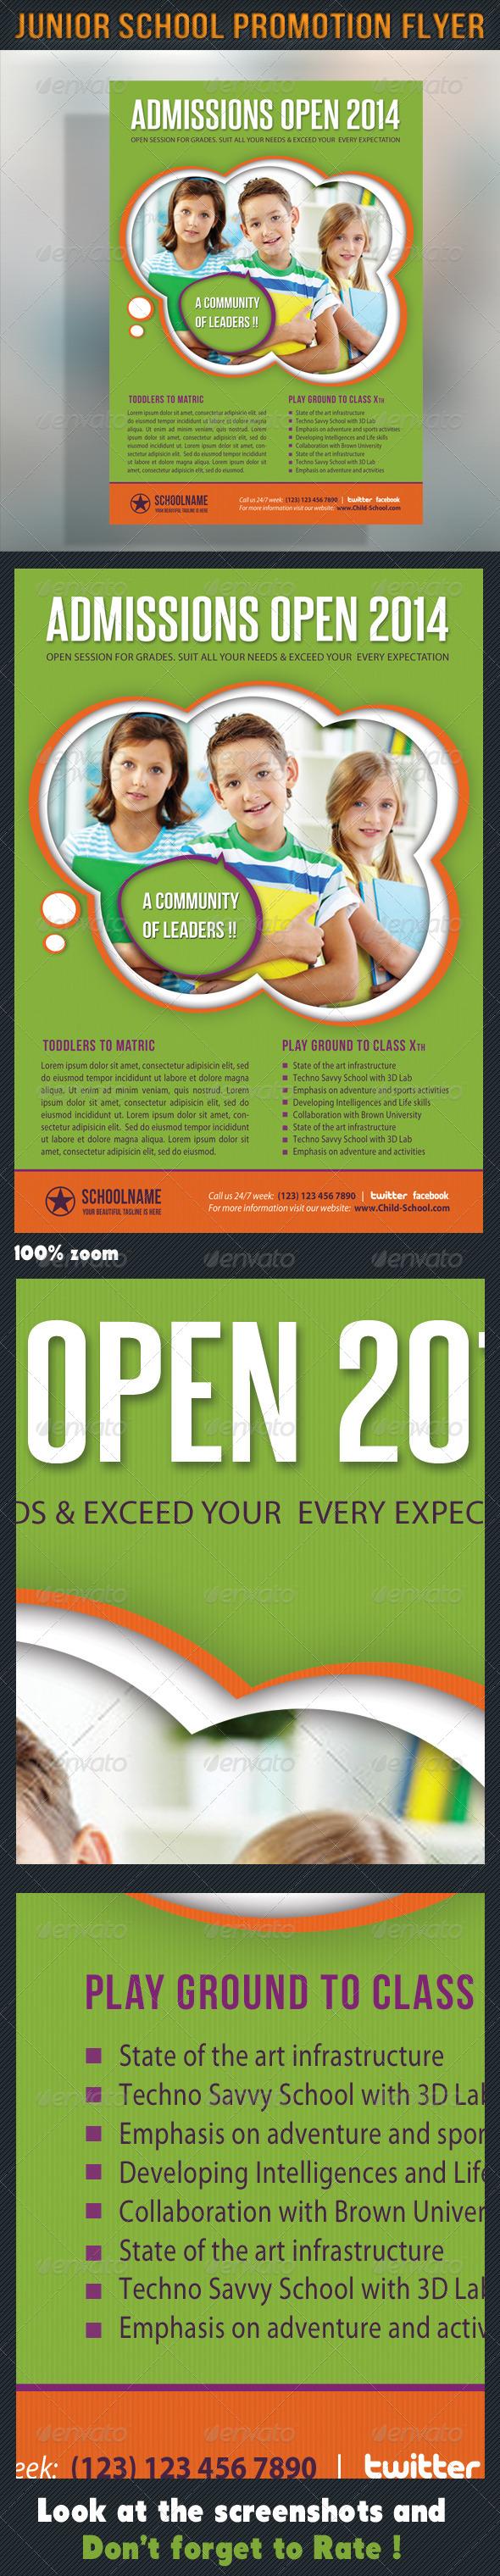 GraphicRiver Junior School Promotion Flyer 03 6903821